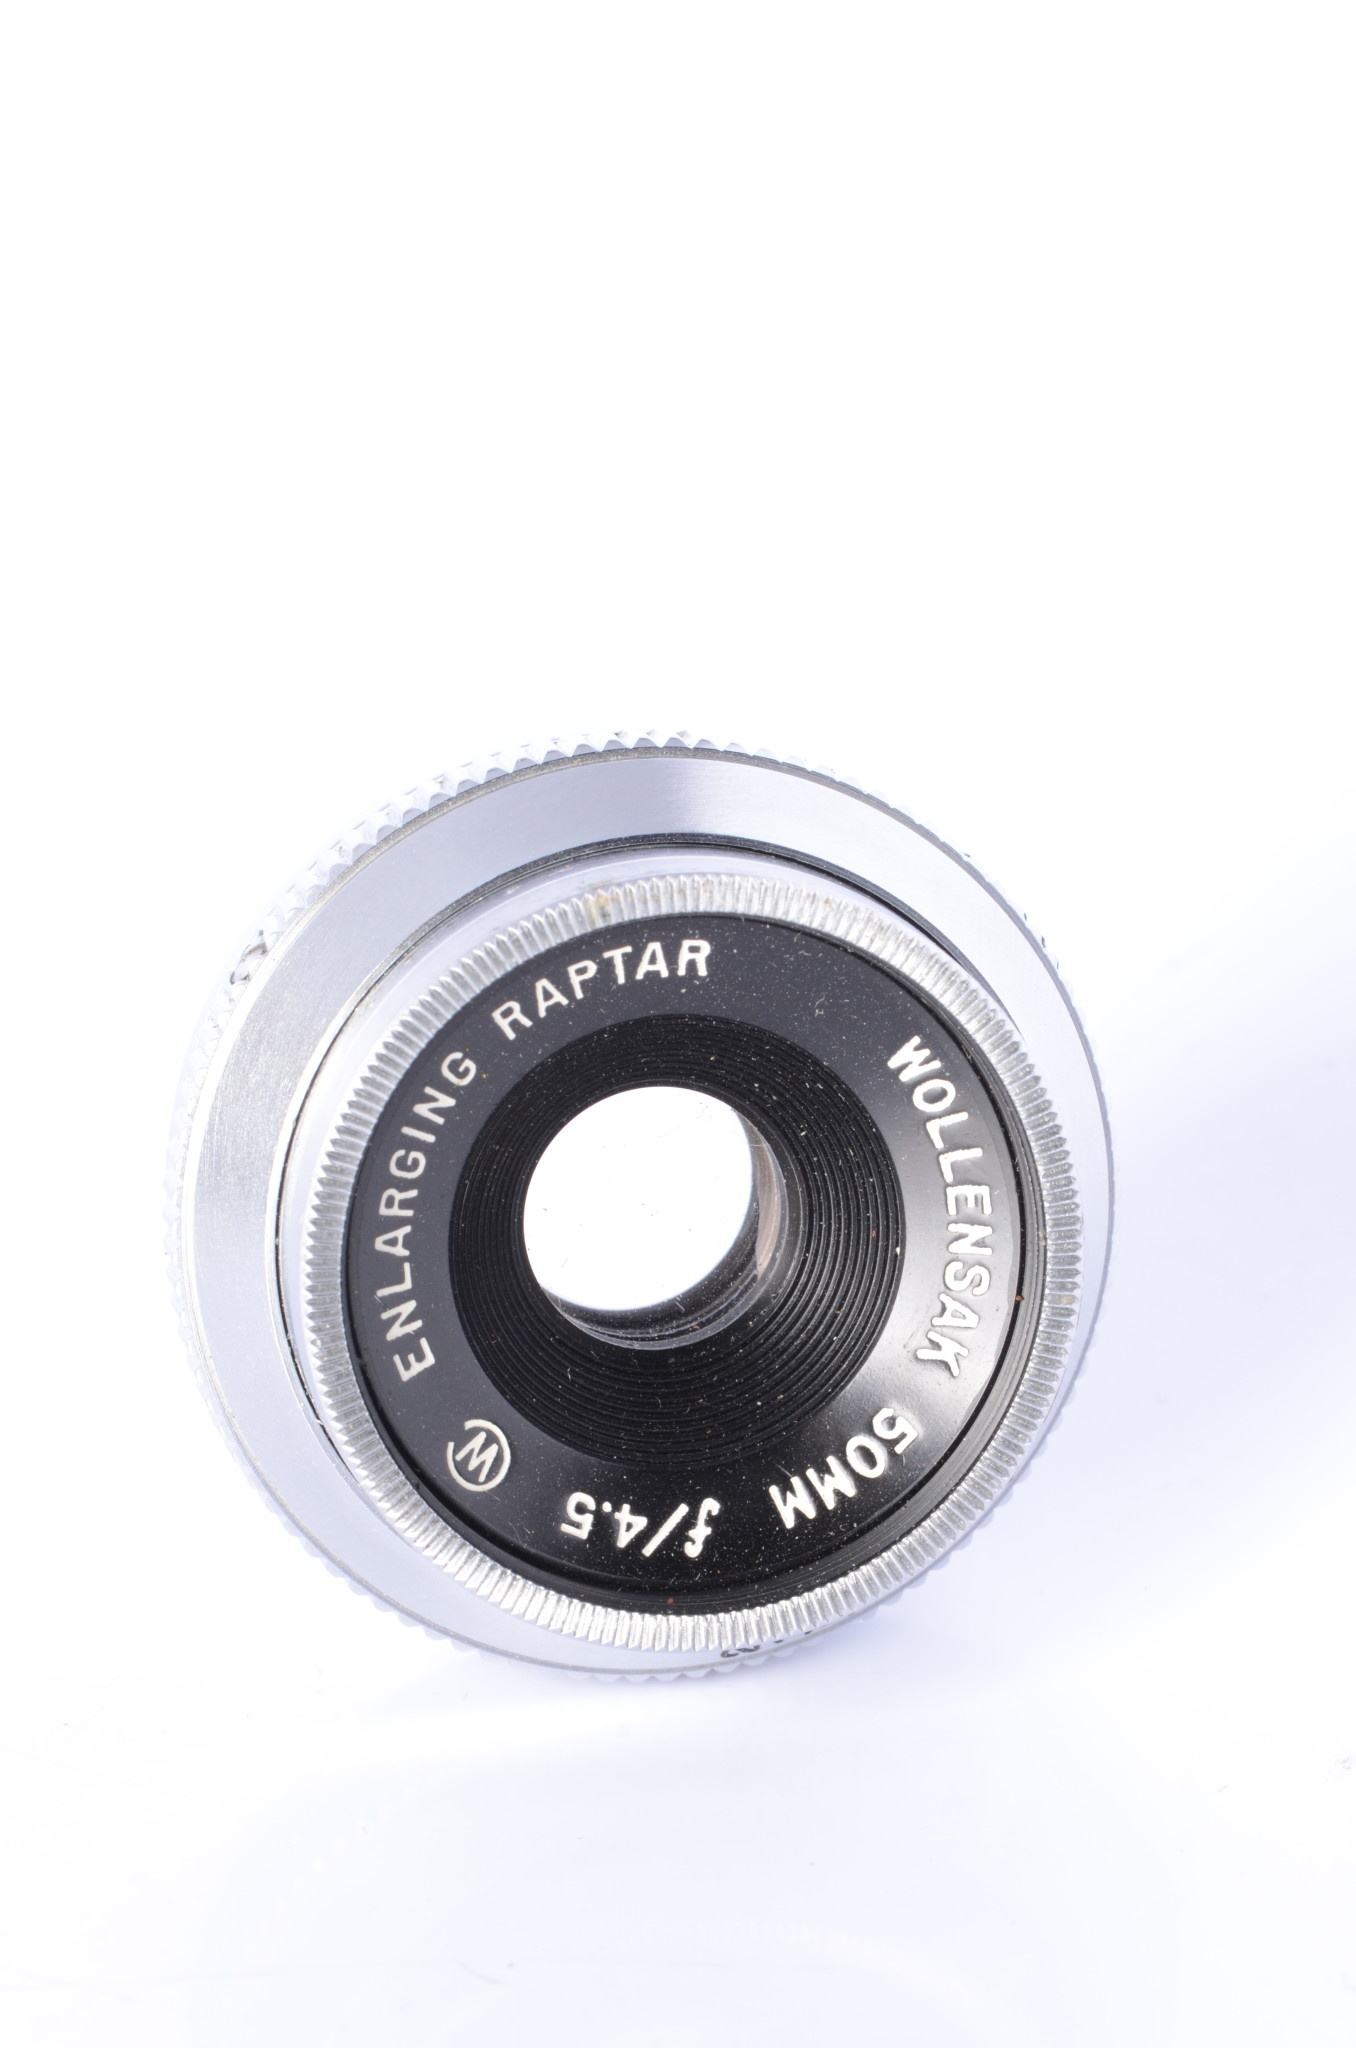 Wollensak Wollensak 50mm f/4.5 Enlarging Raptar lens